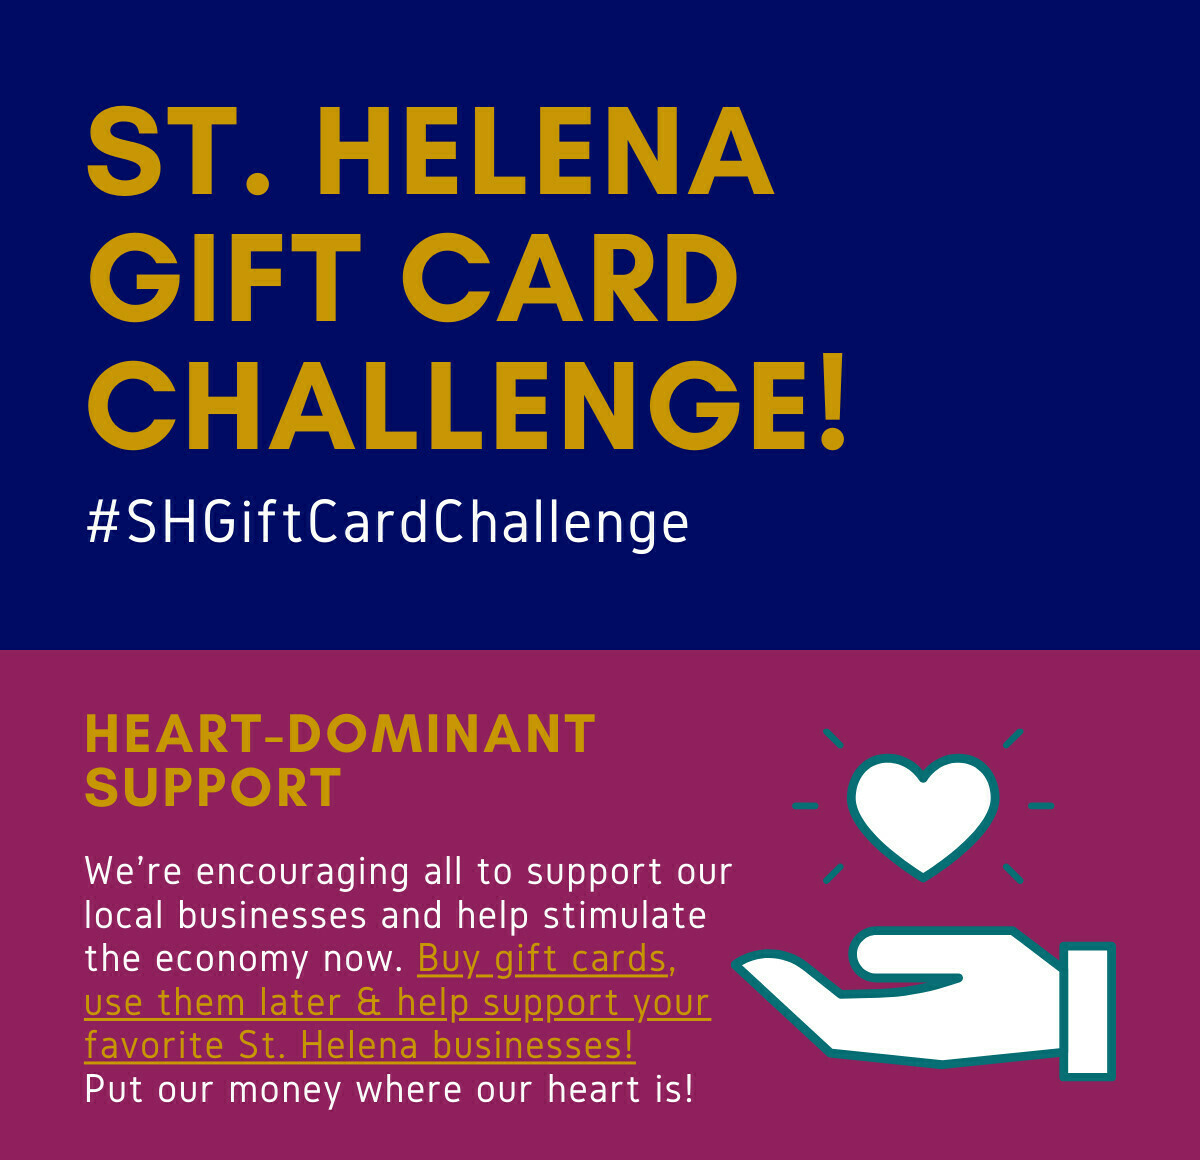 St. Helena Gift Card Challenge, $100